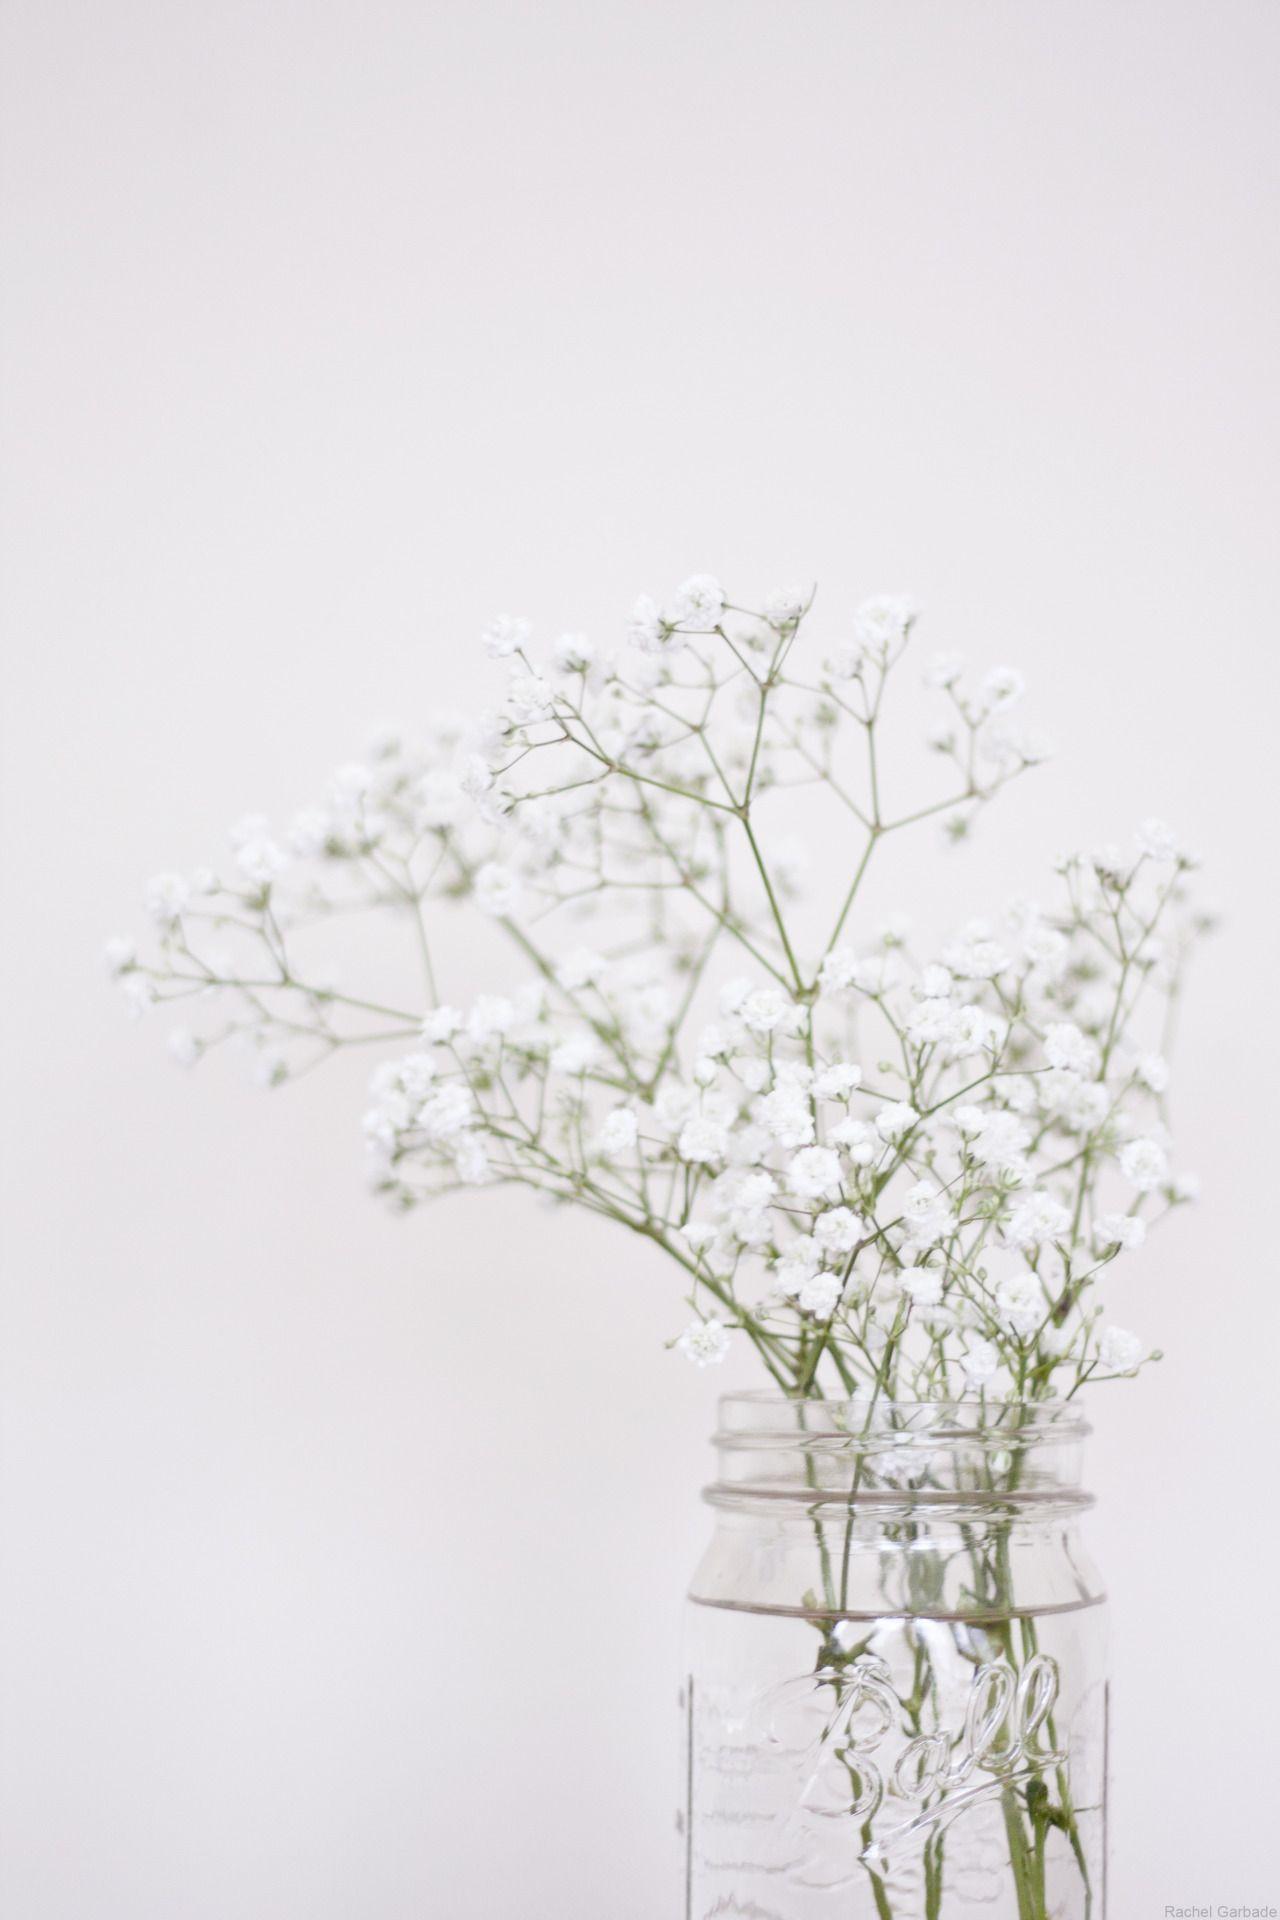 Floral Wallpaper Tumblr Aesthetic